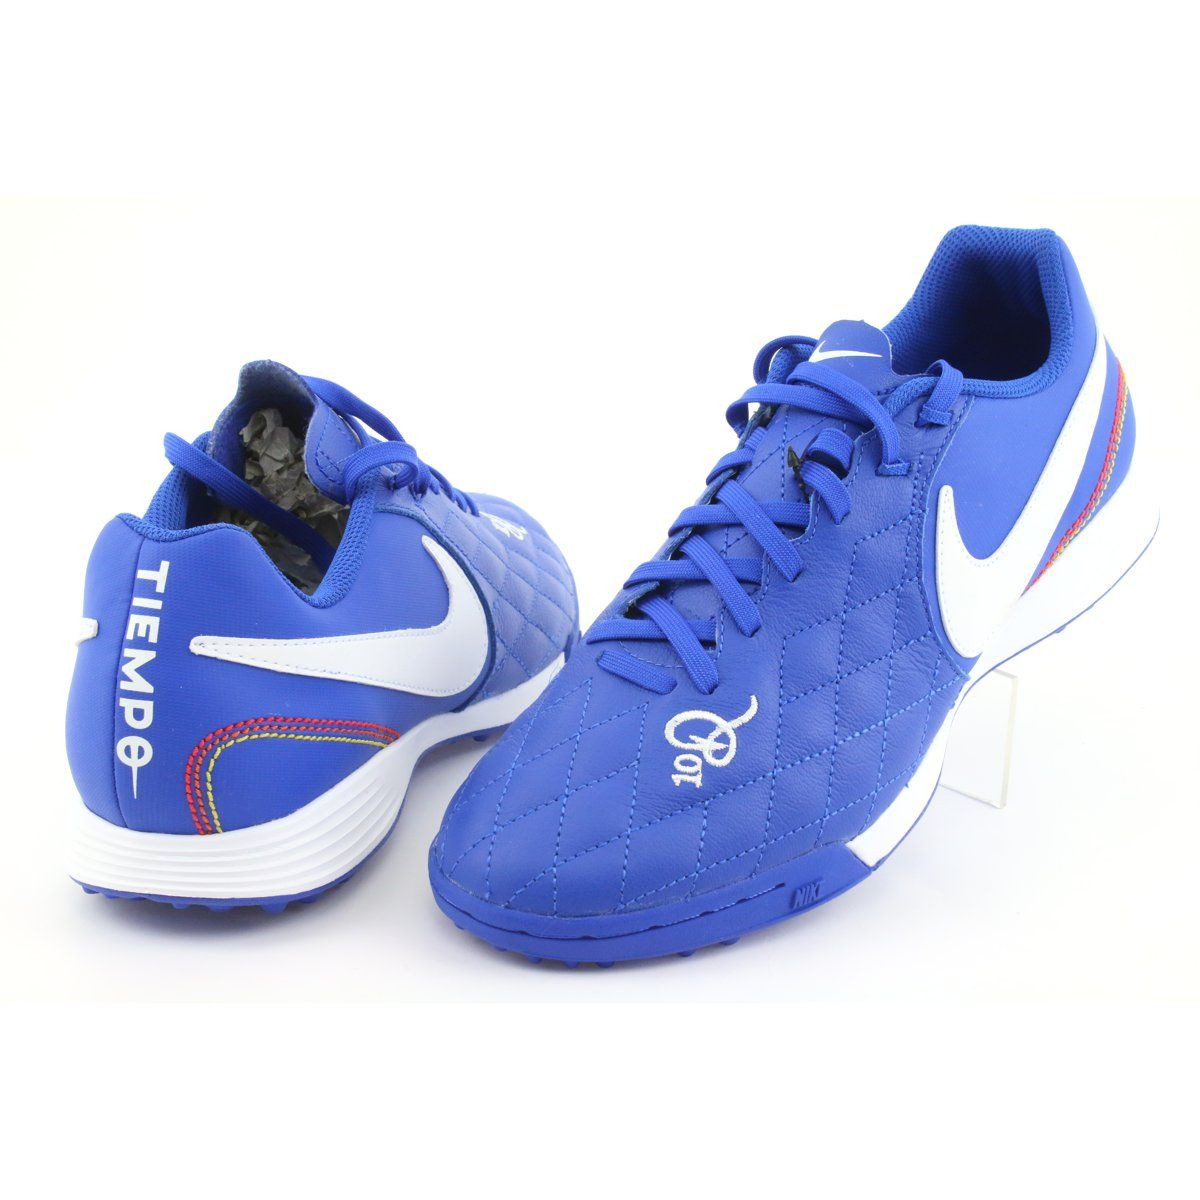 Football shoes Nike Tiempo Legend 7